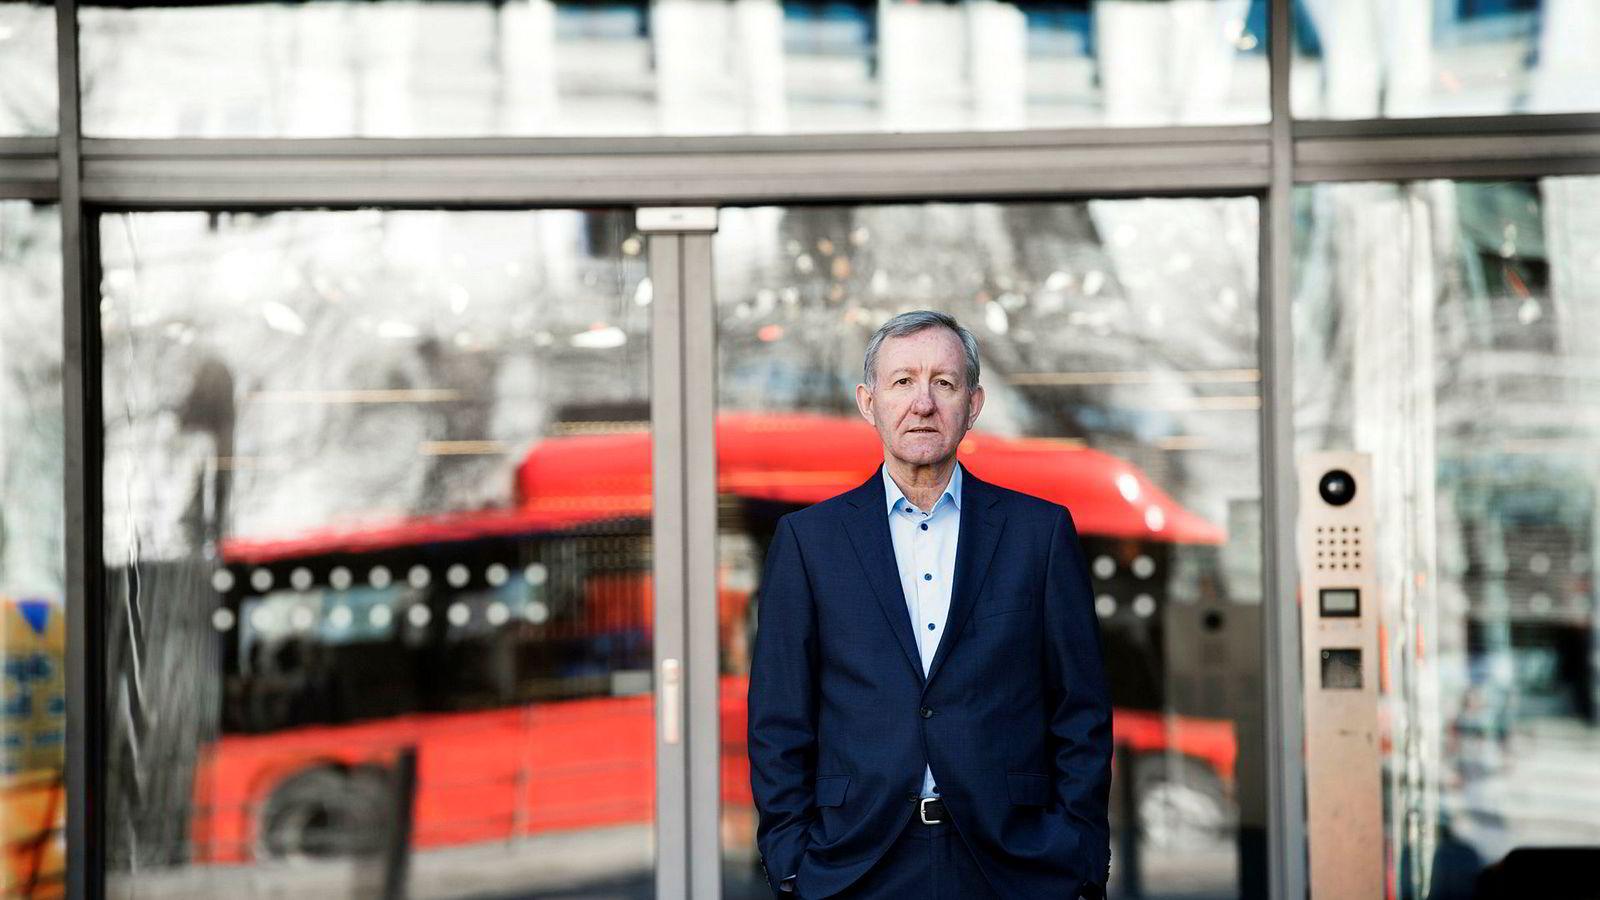 Per Hanstad, administrerende direktør i Den norske Revisorforening, er ikke imponert over hvordan reiseregninger håndteres på Stortinget.